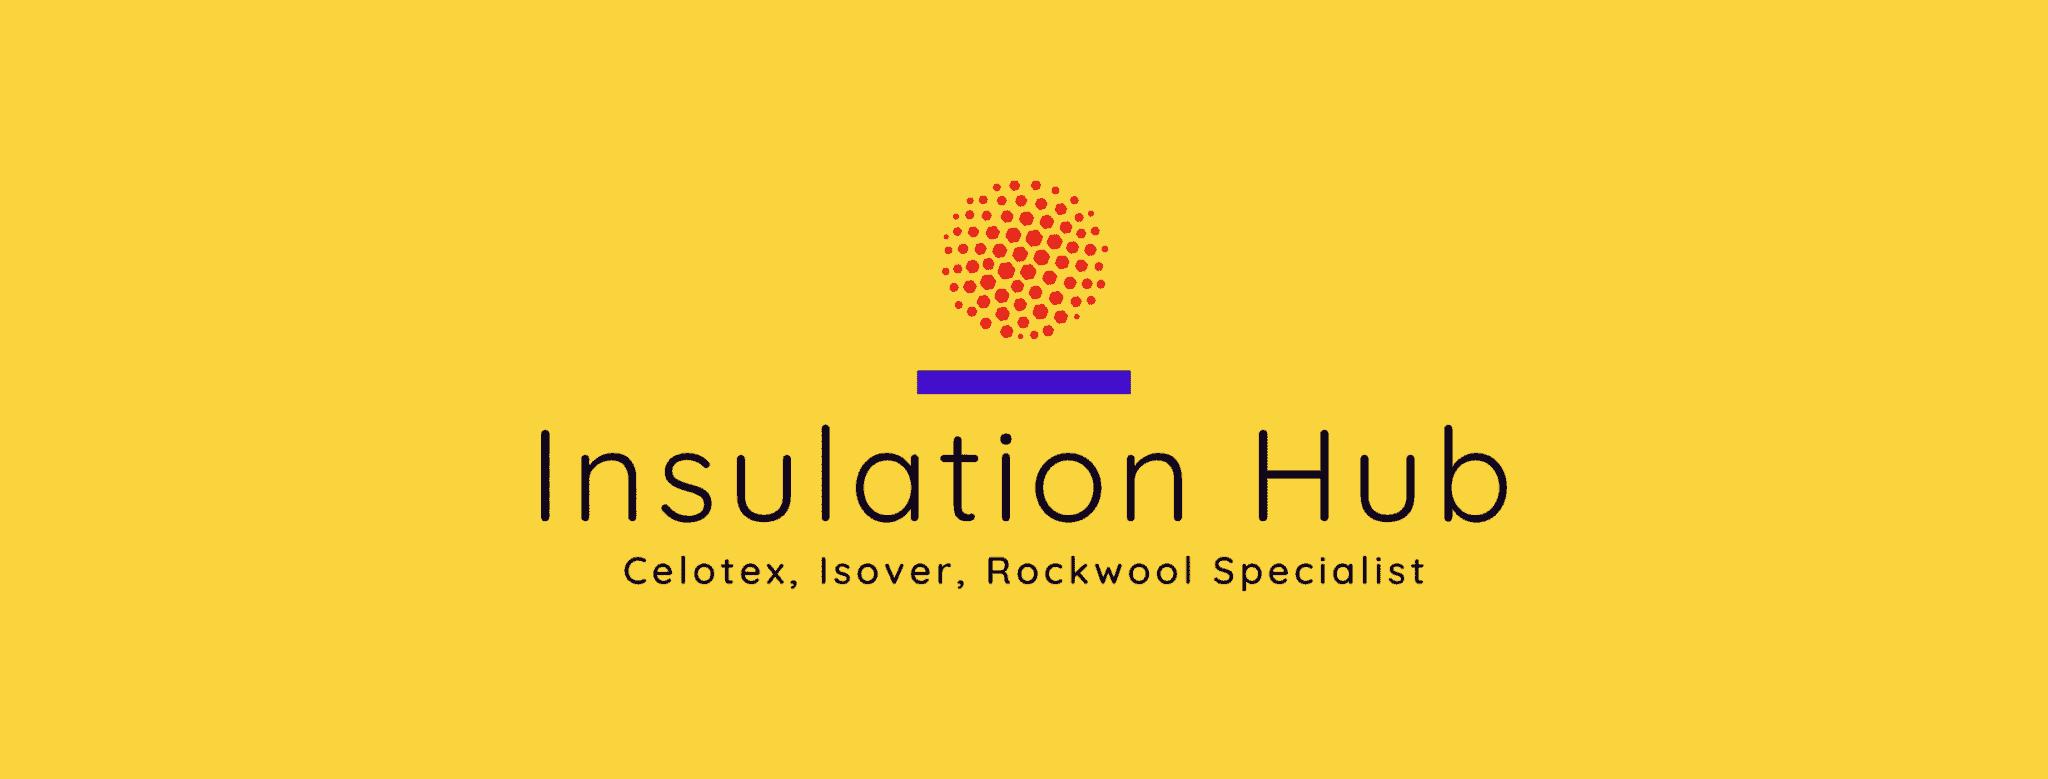 Insulation Hub